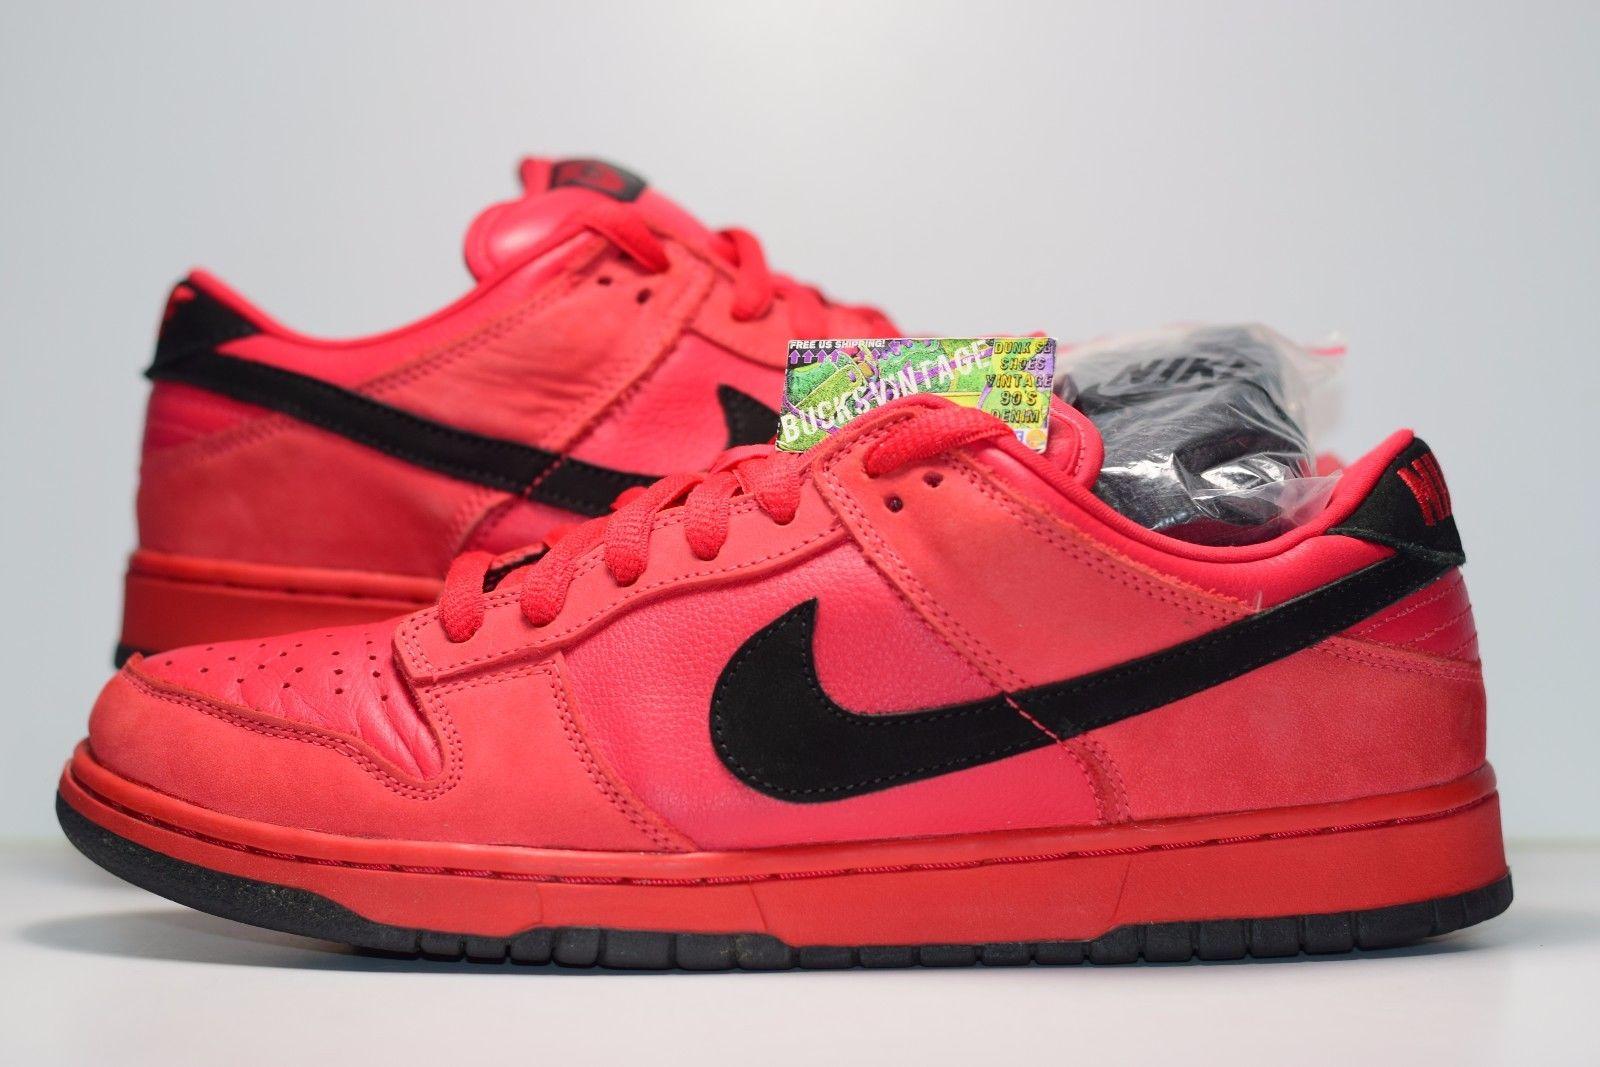 purchase cheap 016e8 7e6c4 Size 10.5  2003 Nike Dunk Low Pro SB TRUE RED Original Authentic 304292-601